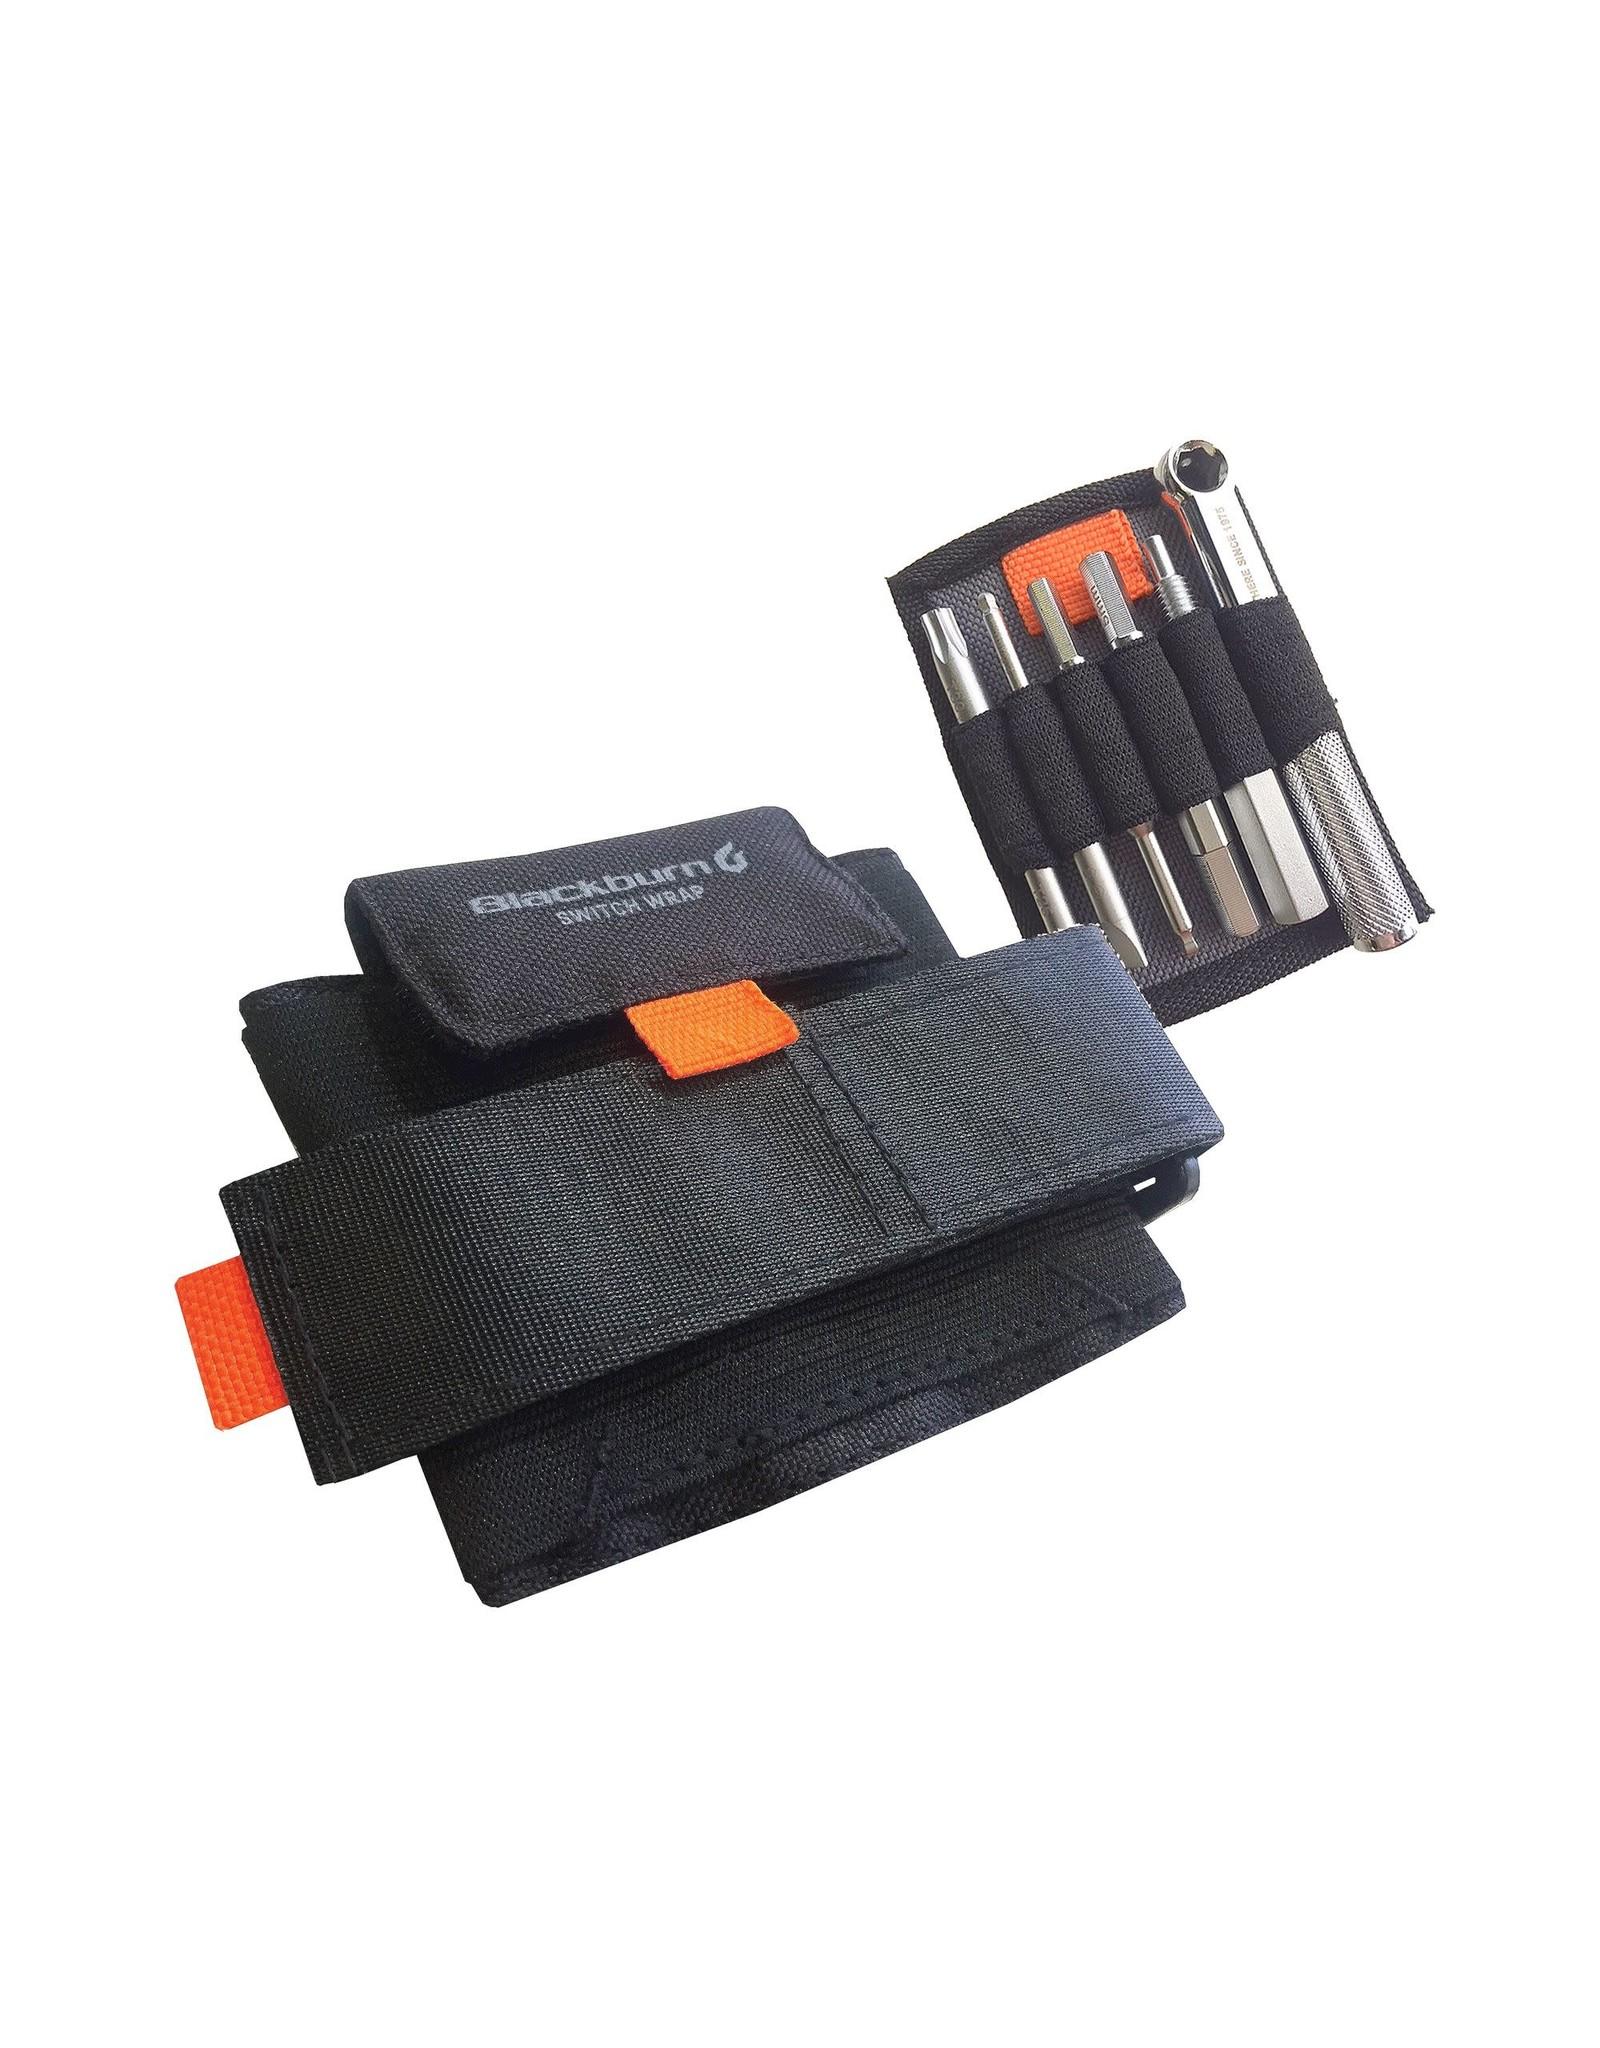 Blackburn Switch Wrap Multi Tool